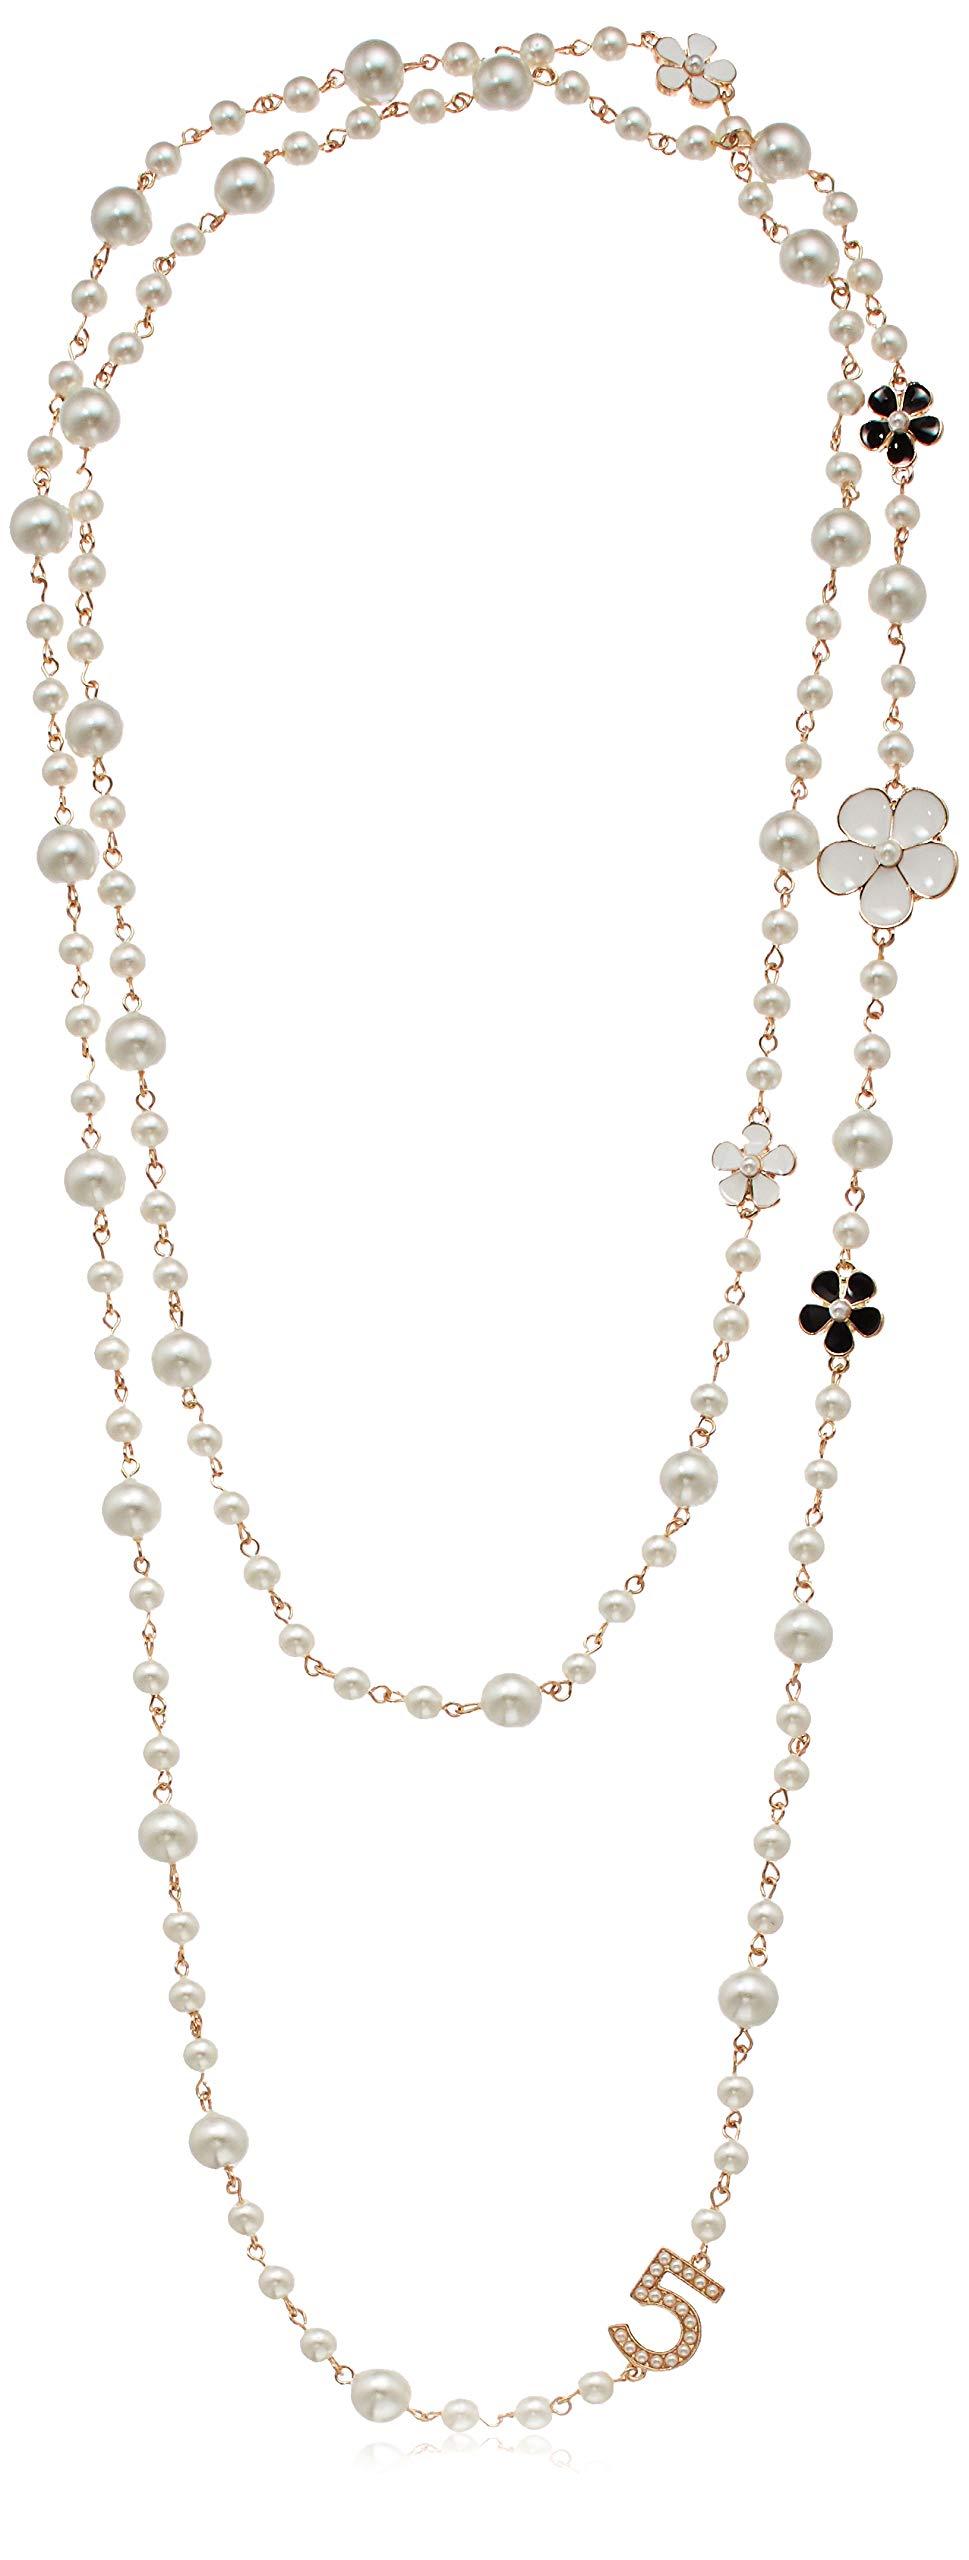 Fashion Jewelry Multipurpose White Imitation Pearl Celebrity Bridal Necklace by Fashion Jewelry